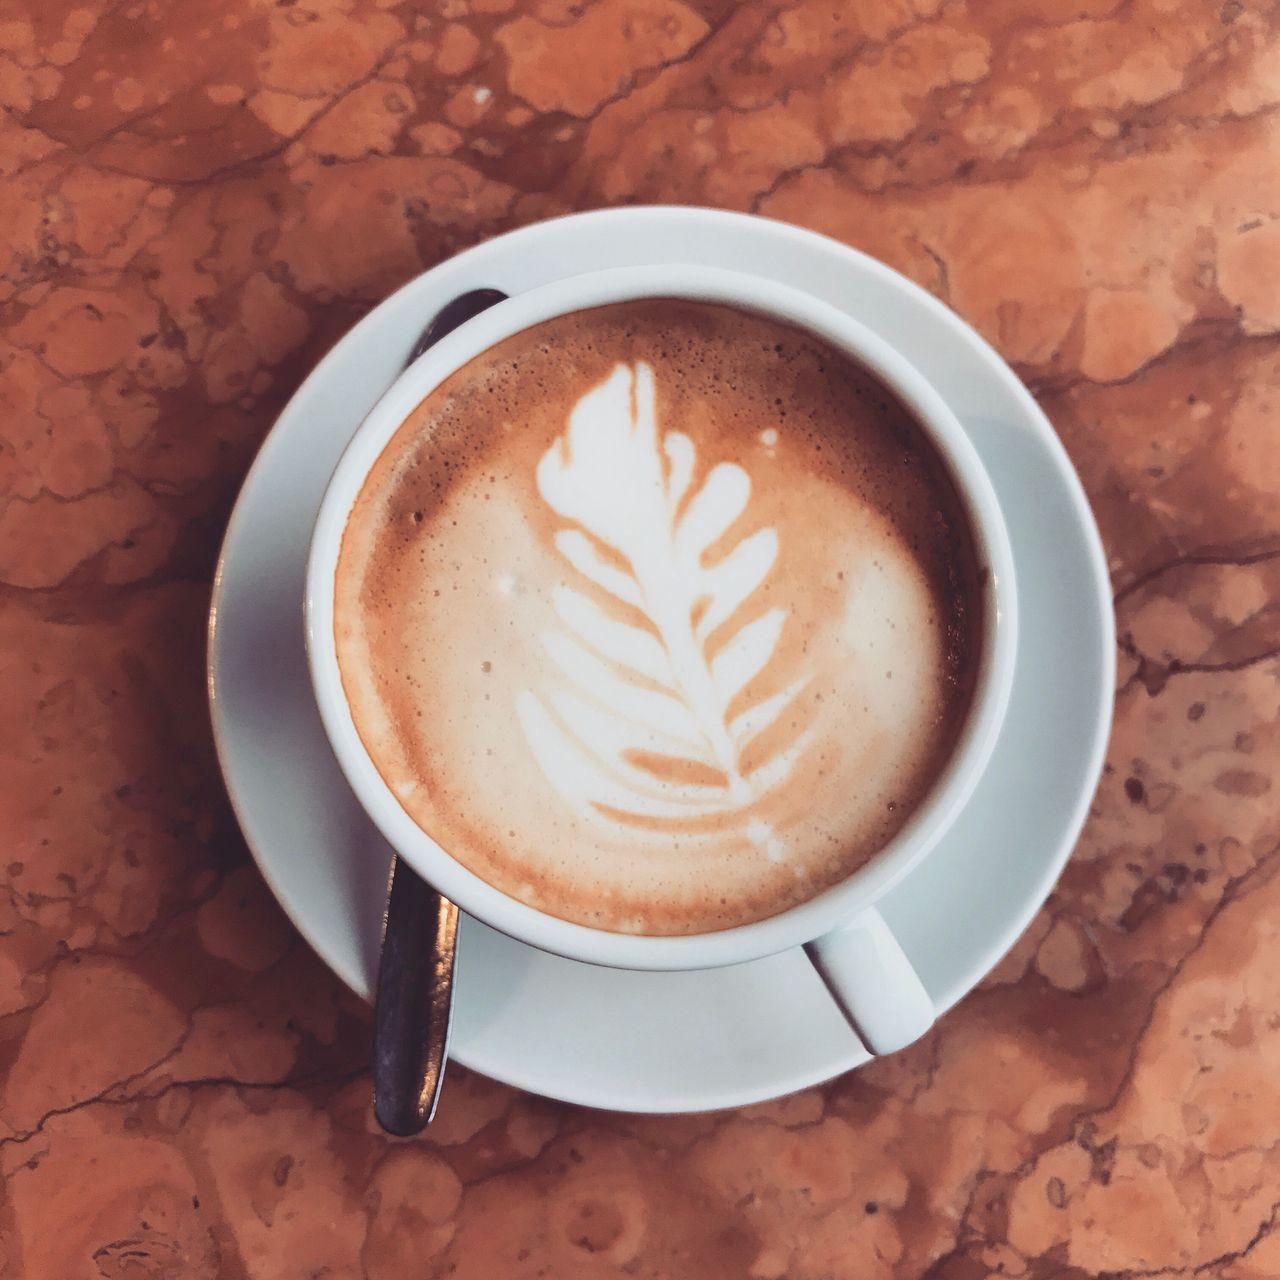 Coffee Cup Cappuccino Bavaria Germany Munich Coffee